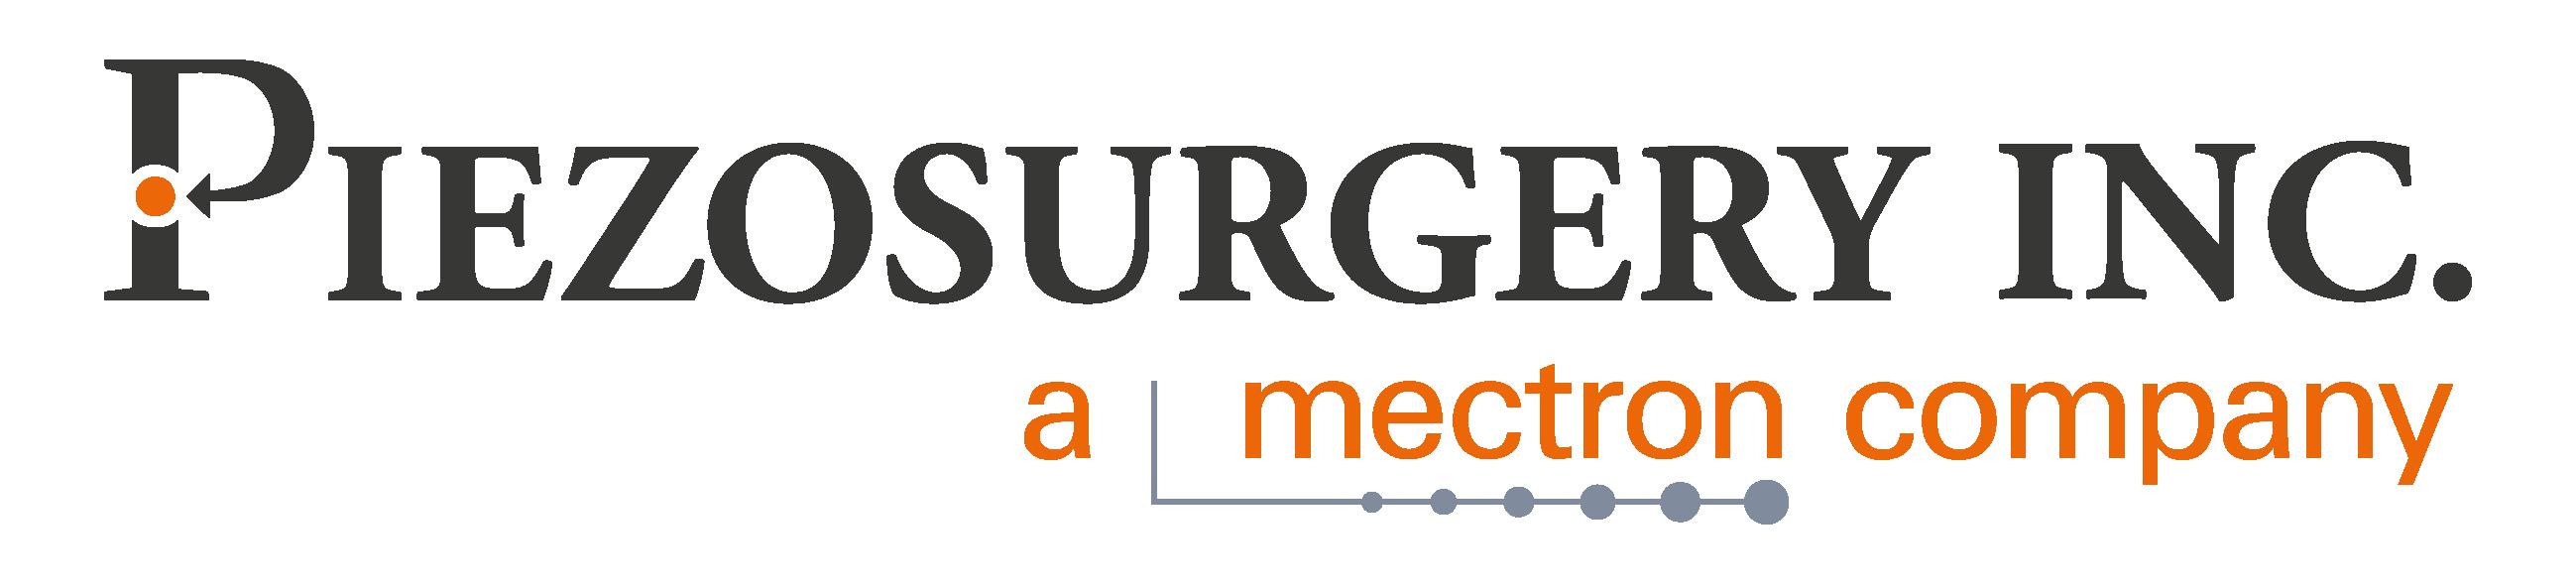 Logo_Piezosurgery_Inc_190320